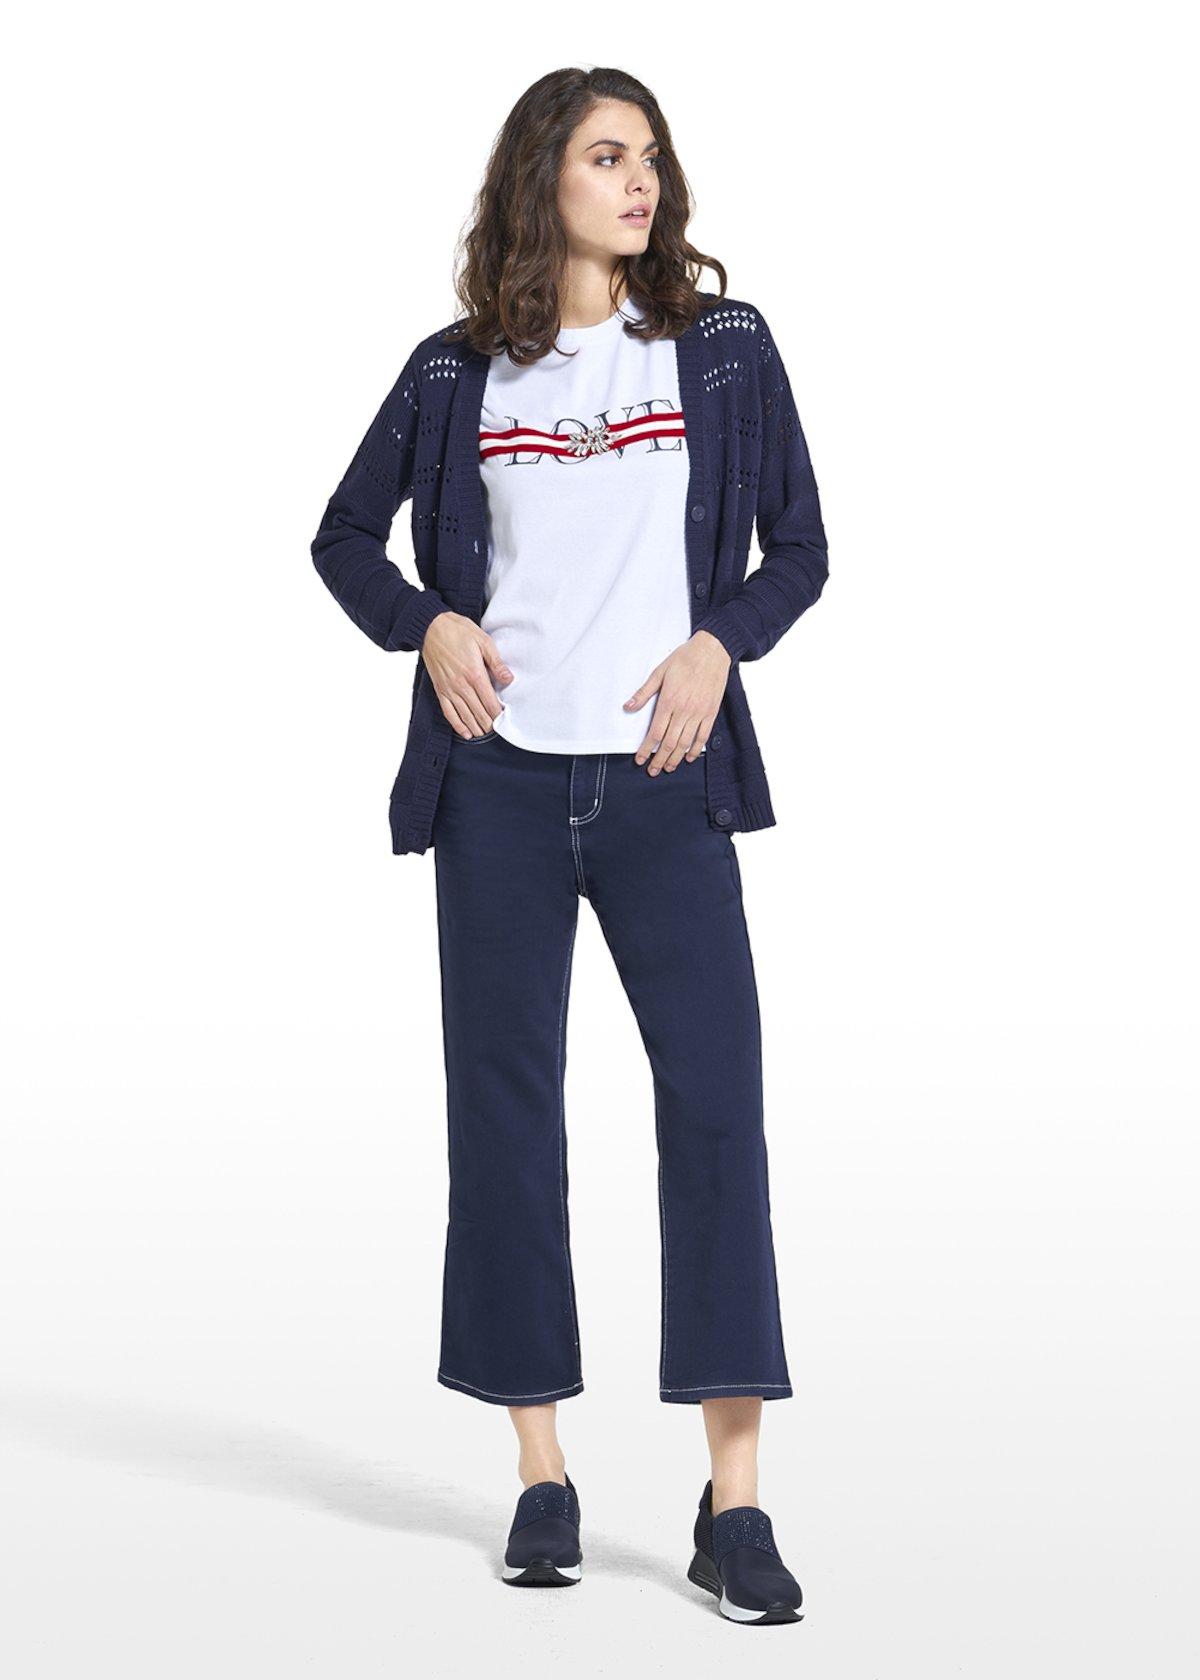 Cardigan Couli con chiusura a bottoni - Medium Blue - Donna - Immagine categoria